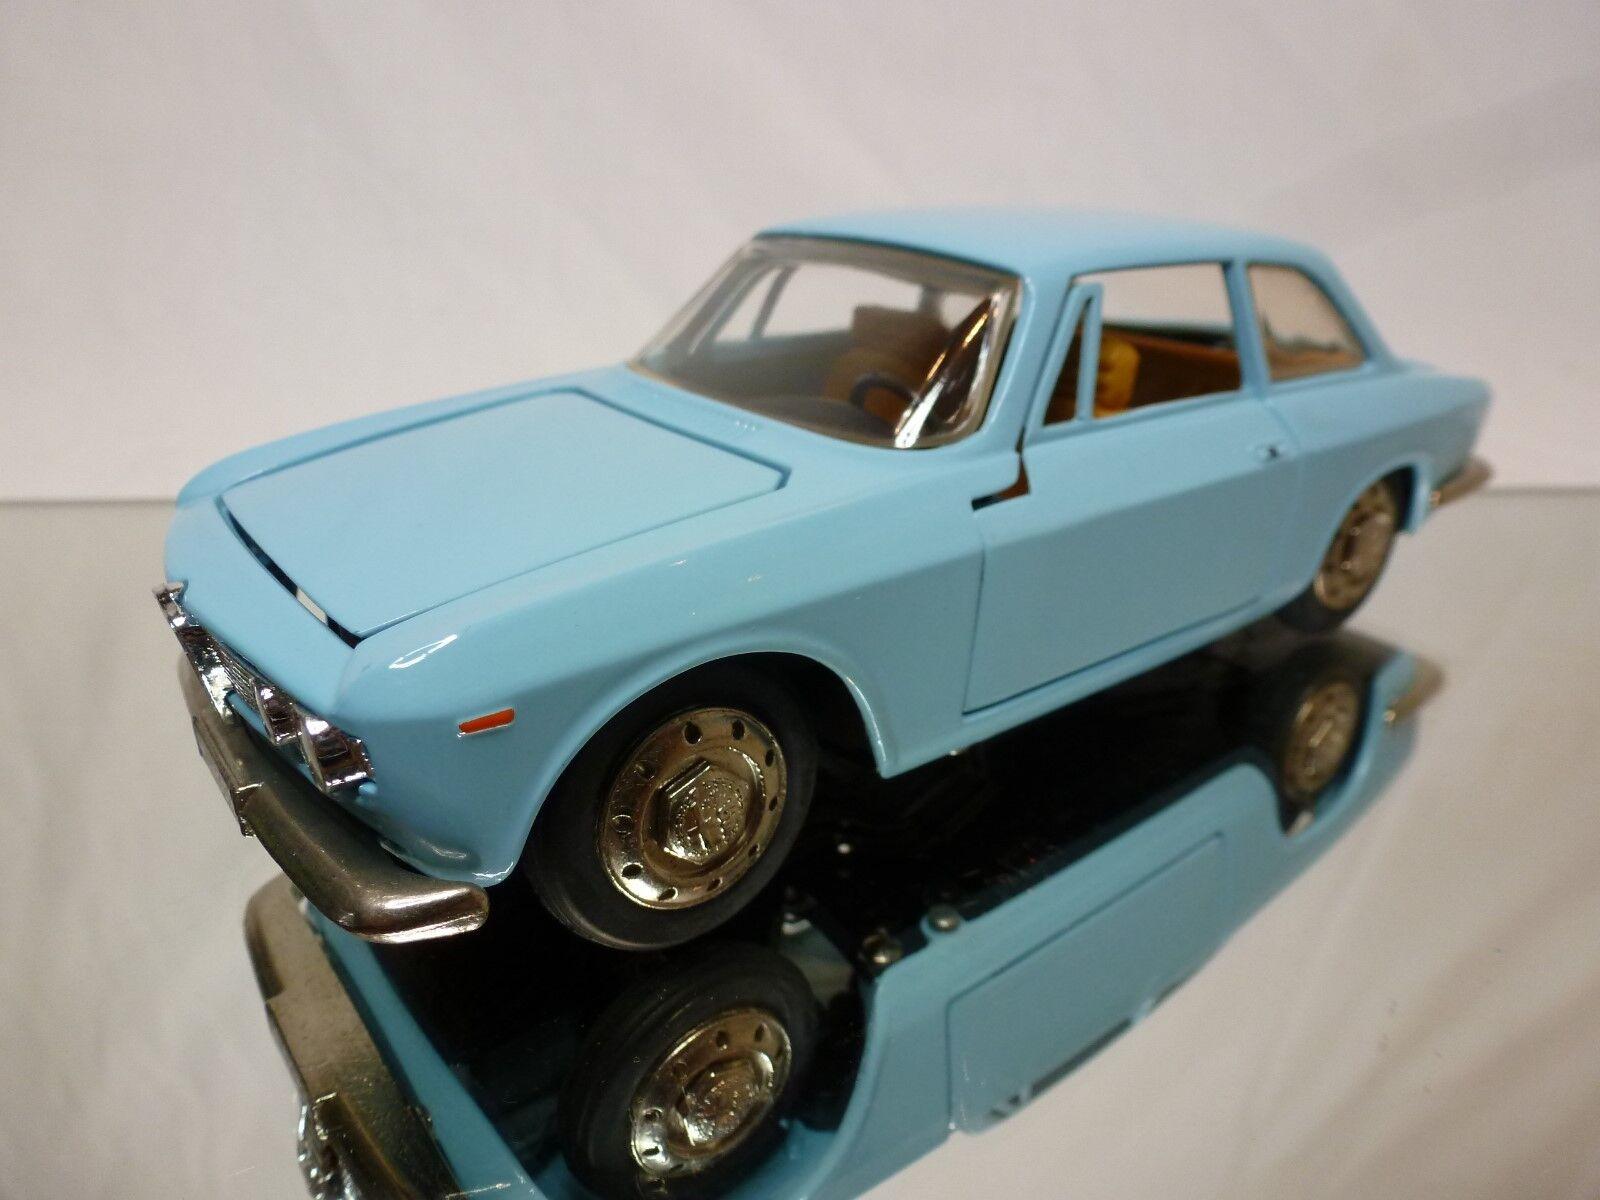 TOGI 8 ALFA ROMEO GIULIA GT SPRINT - LIGHT blueE 1 23 - EXCELLENT CCONDITION